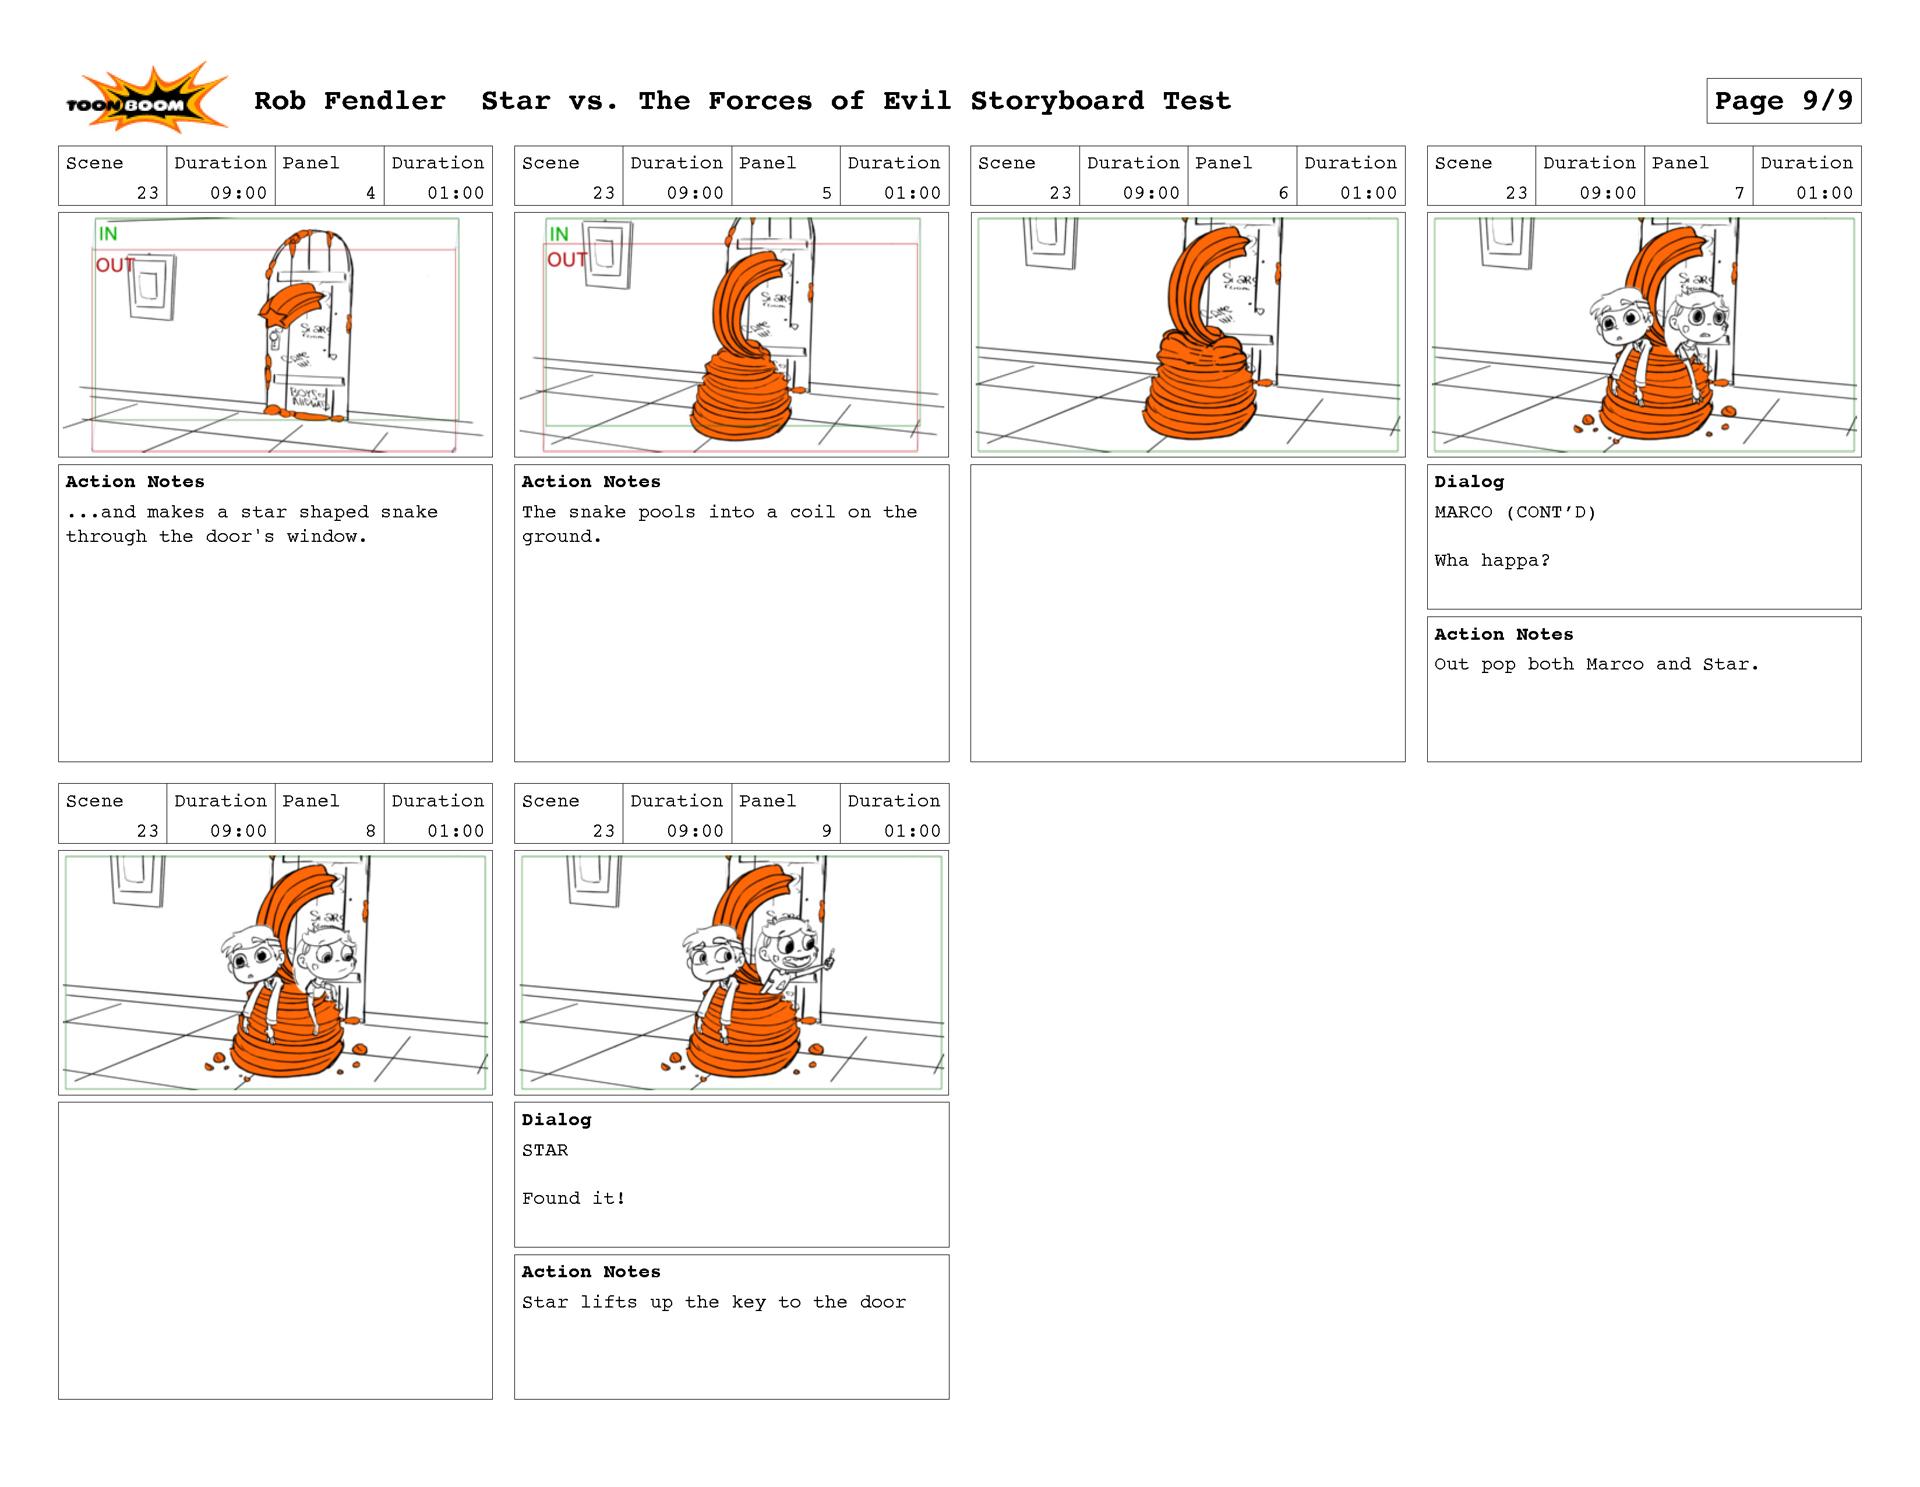 StarVs_Storyboardtest_Page_9_1920